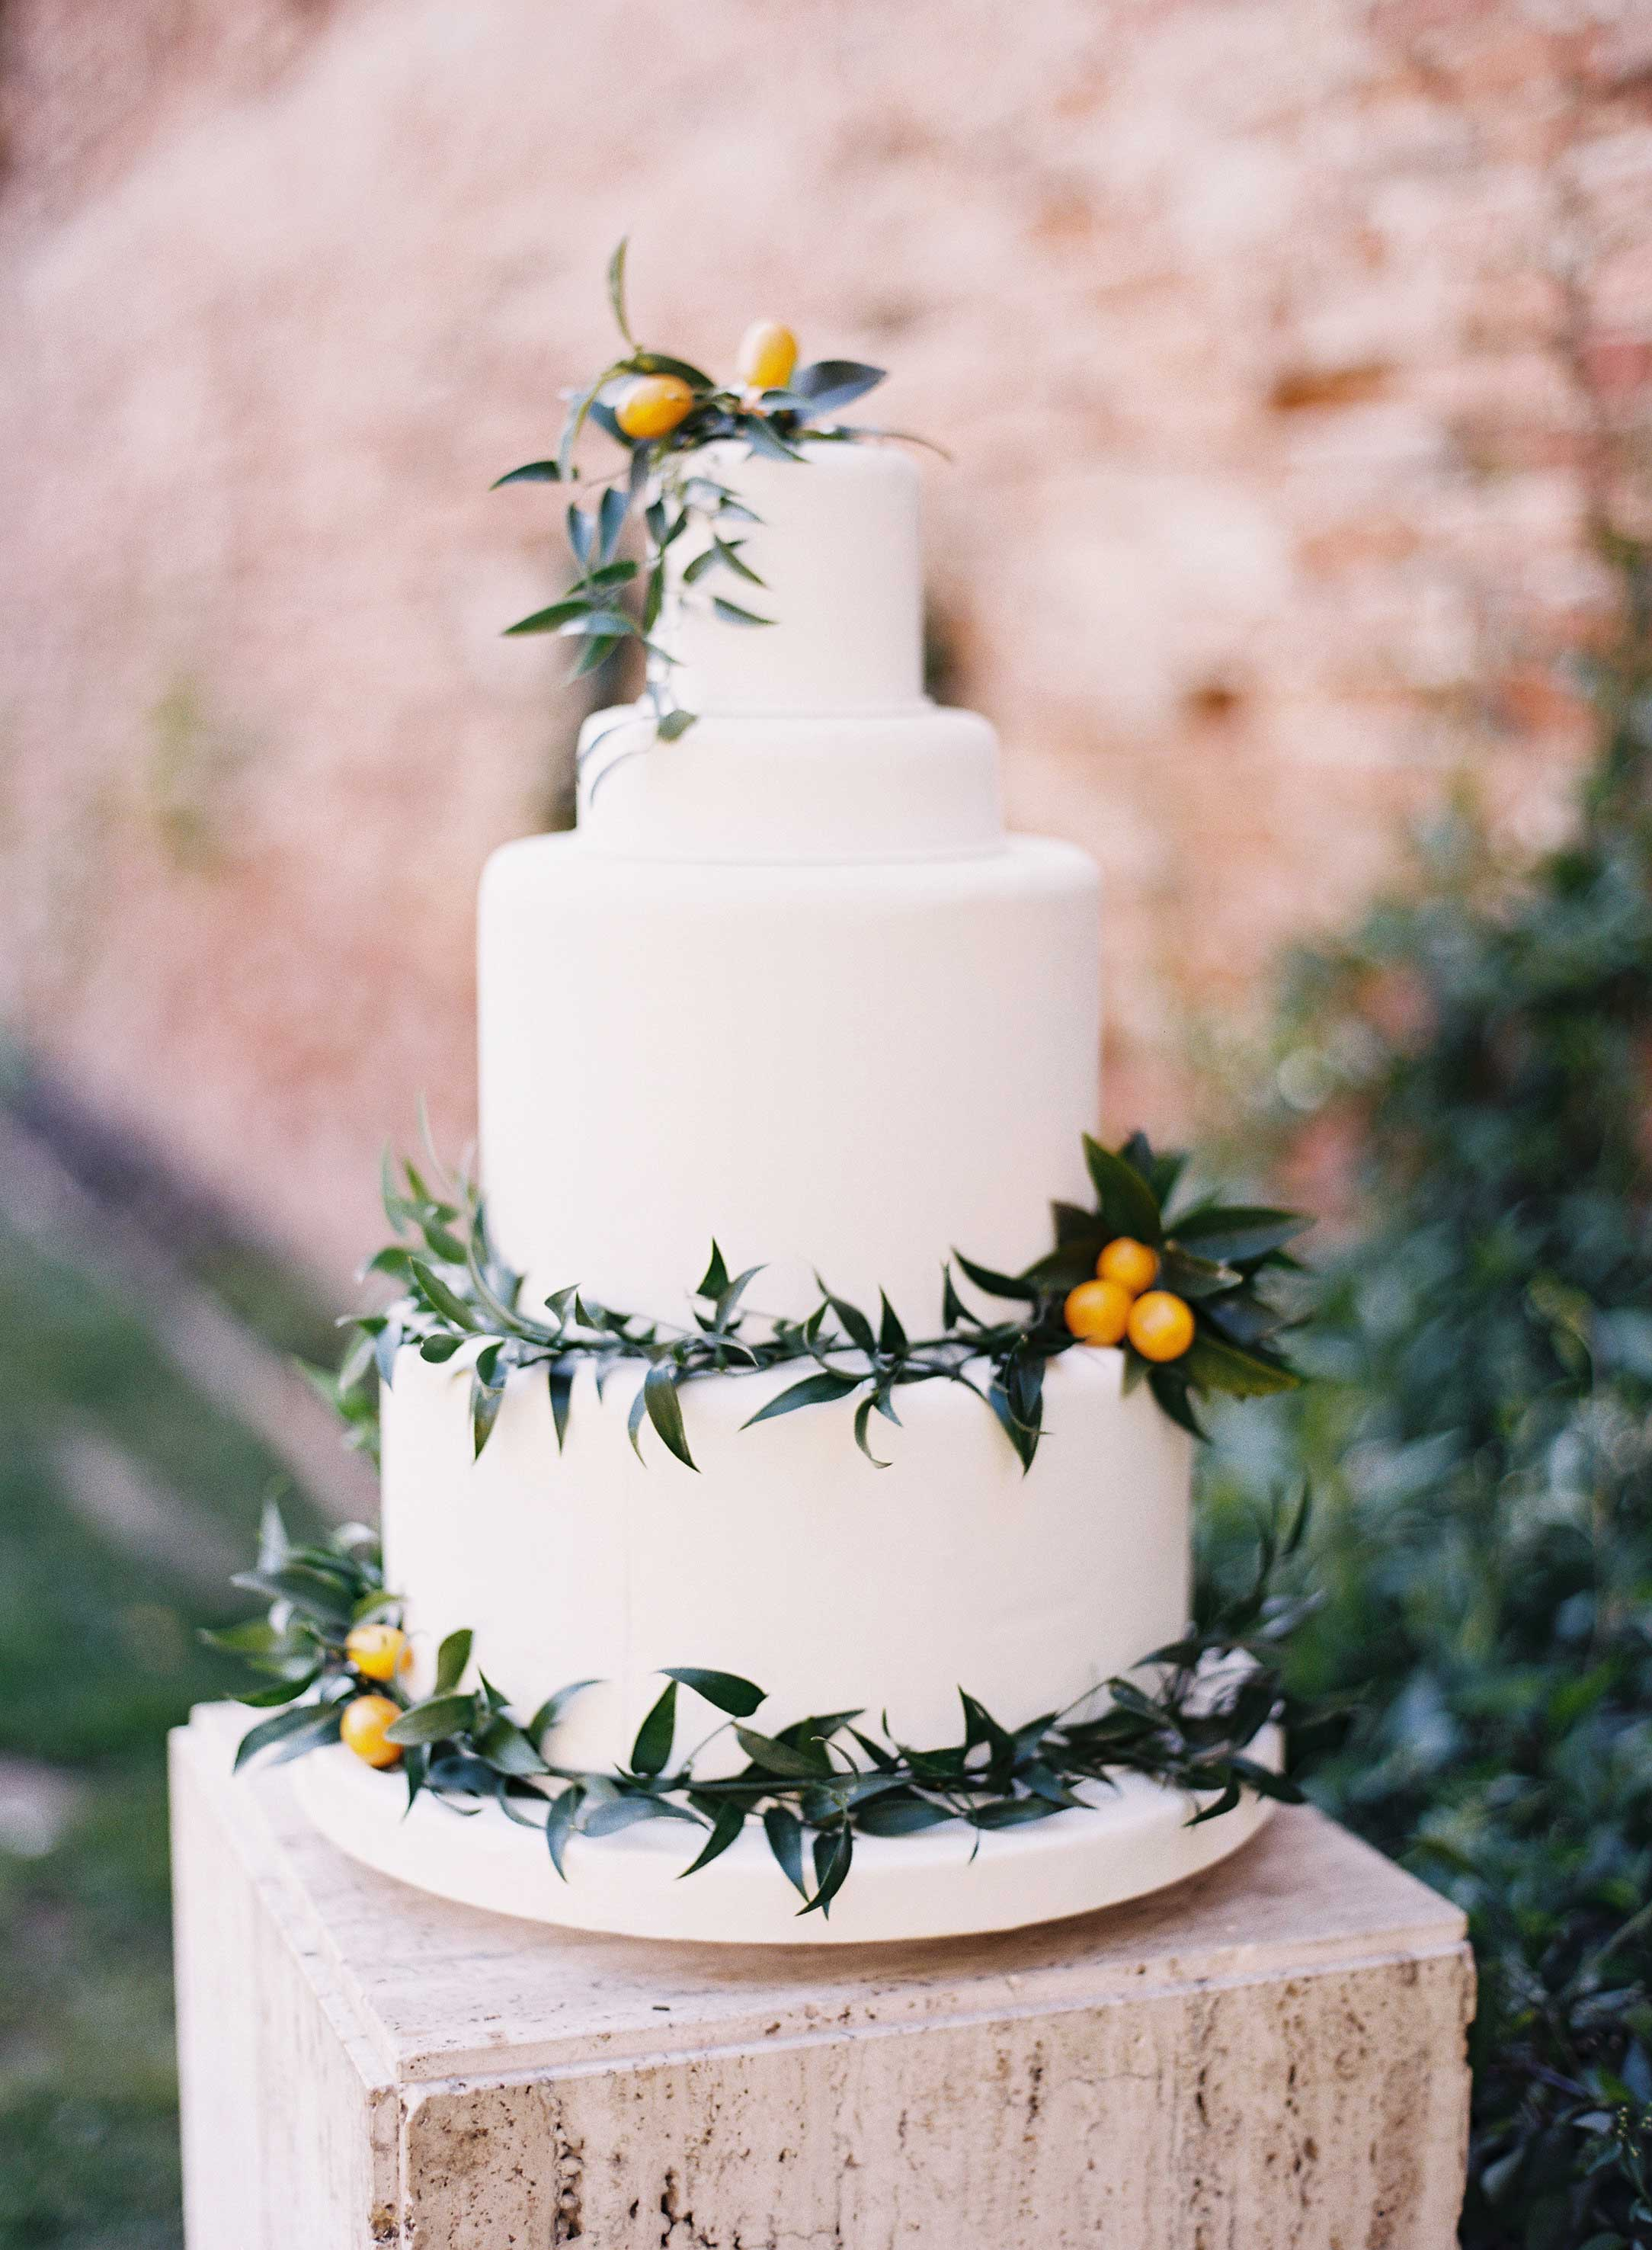 white cake with greenery